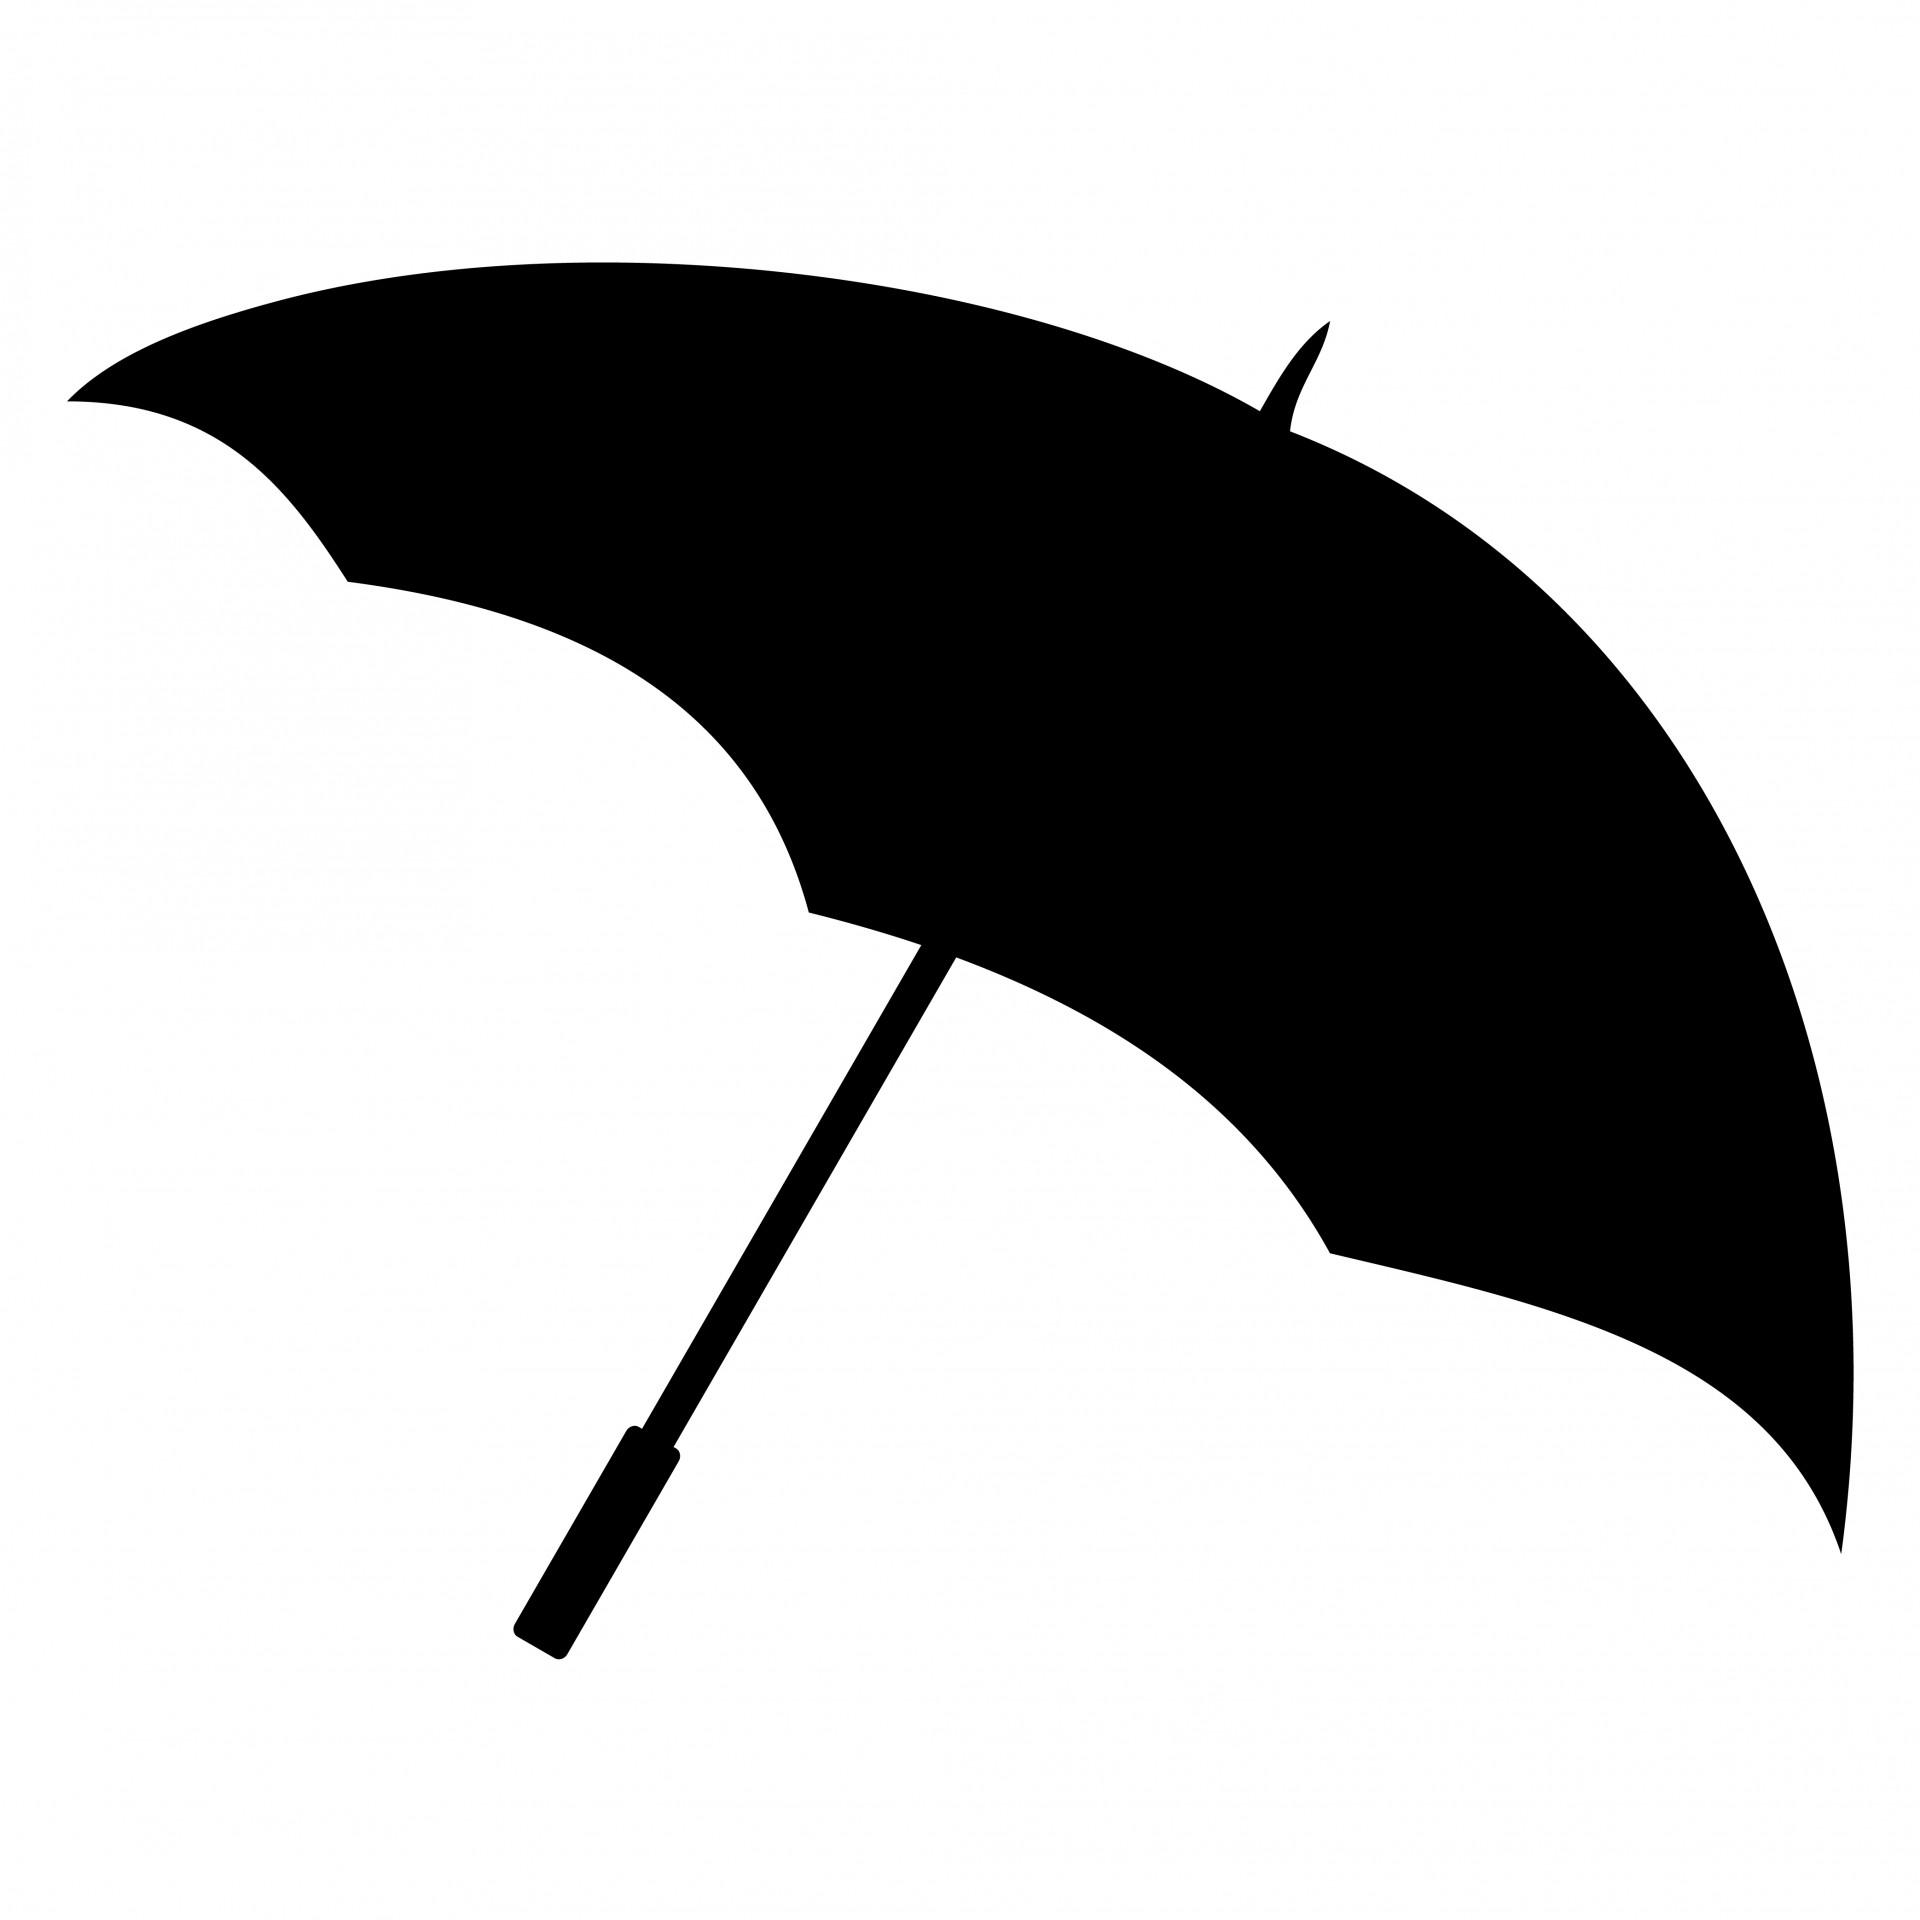 1920x1920 Umbrella Clipart Free Stock Photo